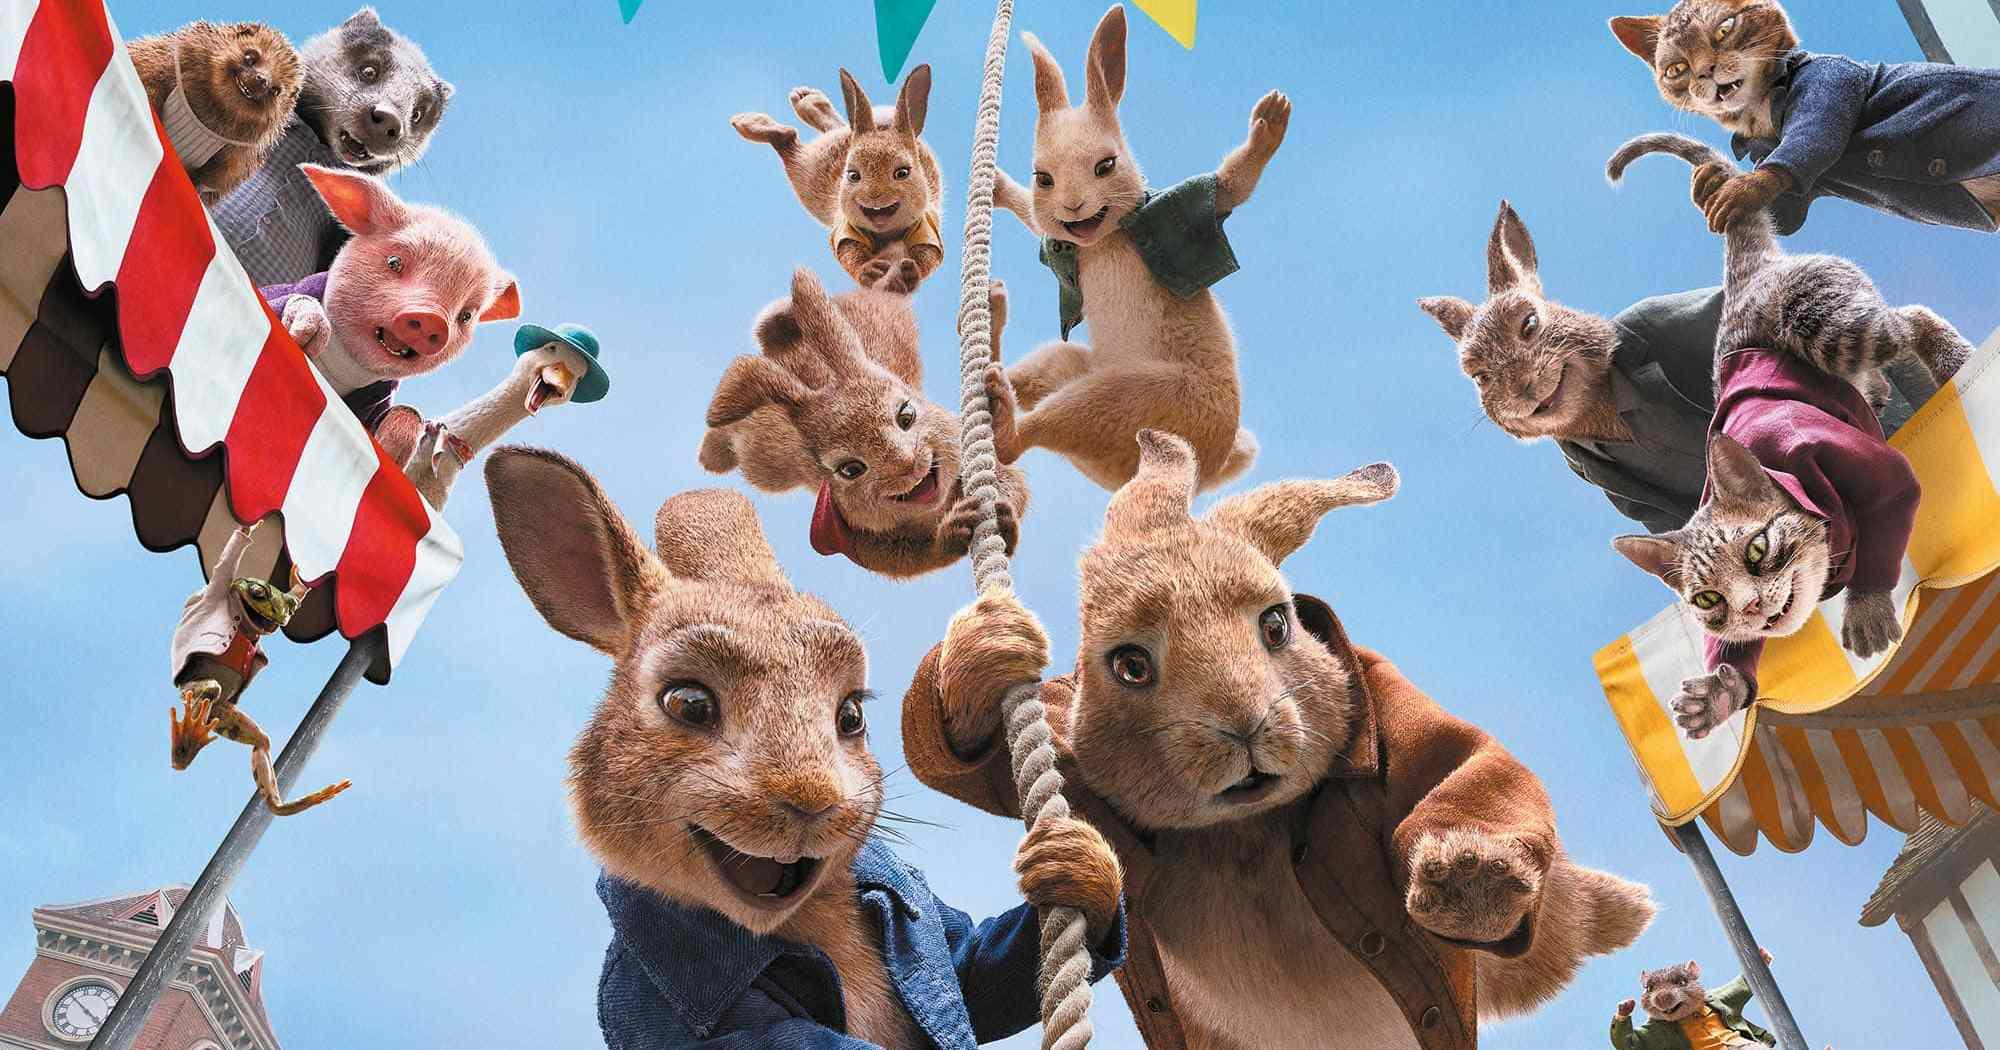 Pierre Rabbit 2 sortira le 30 juin 2021